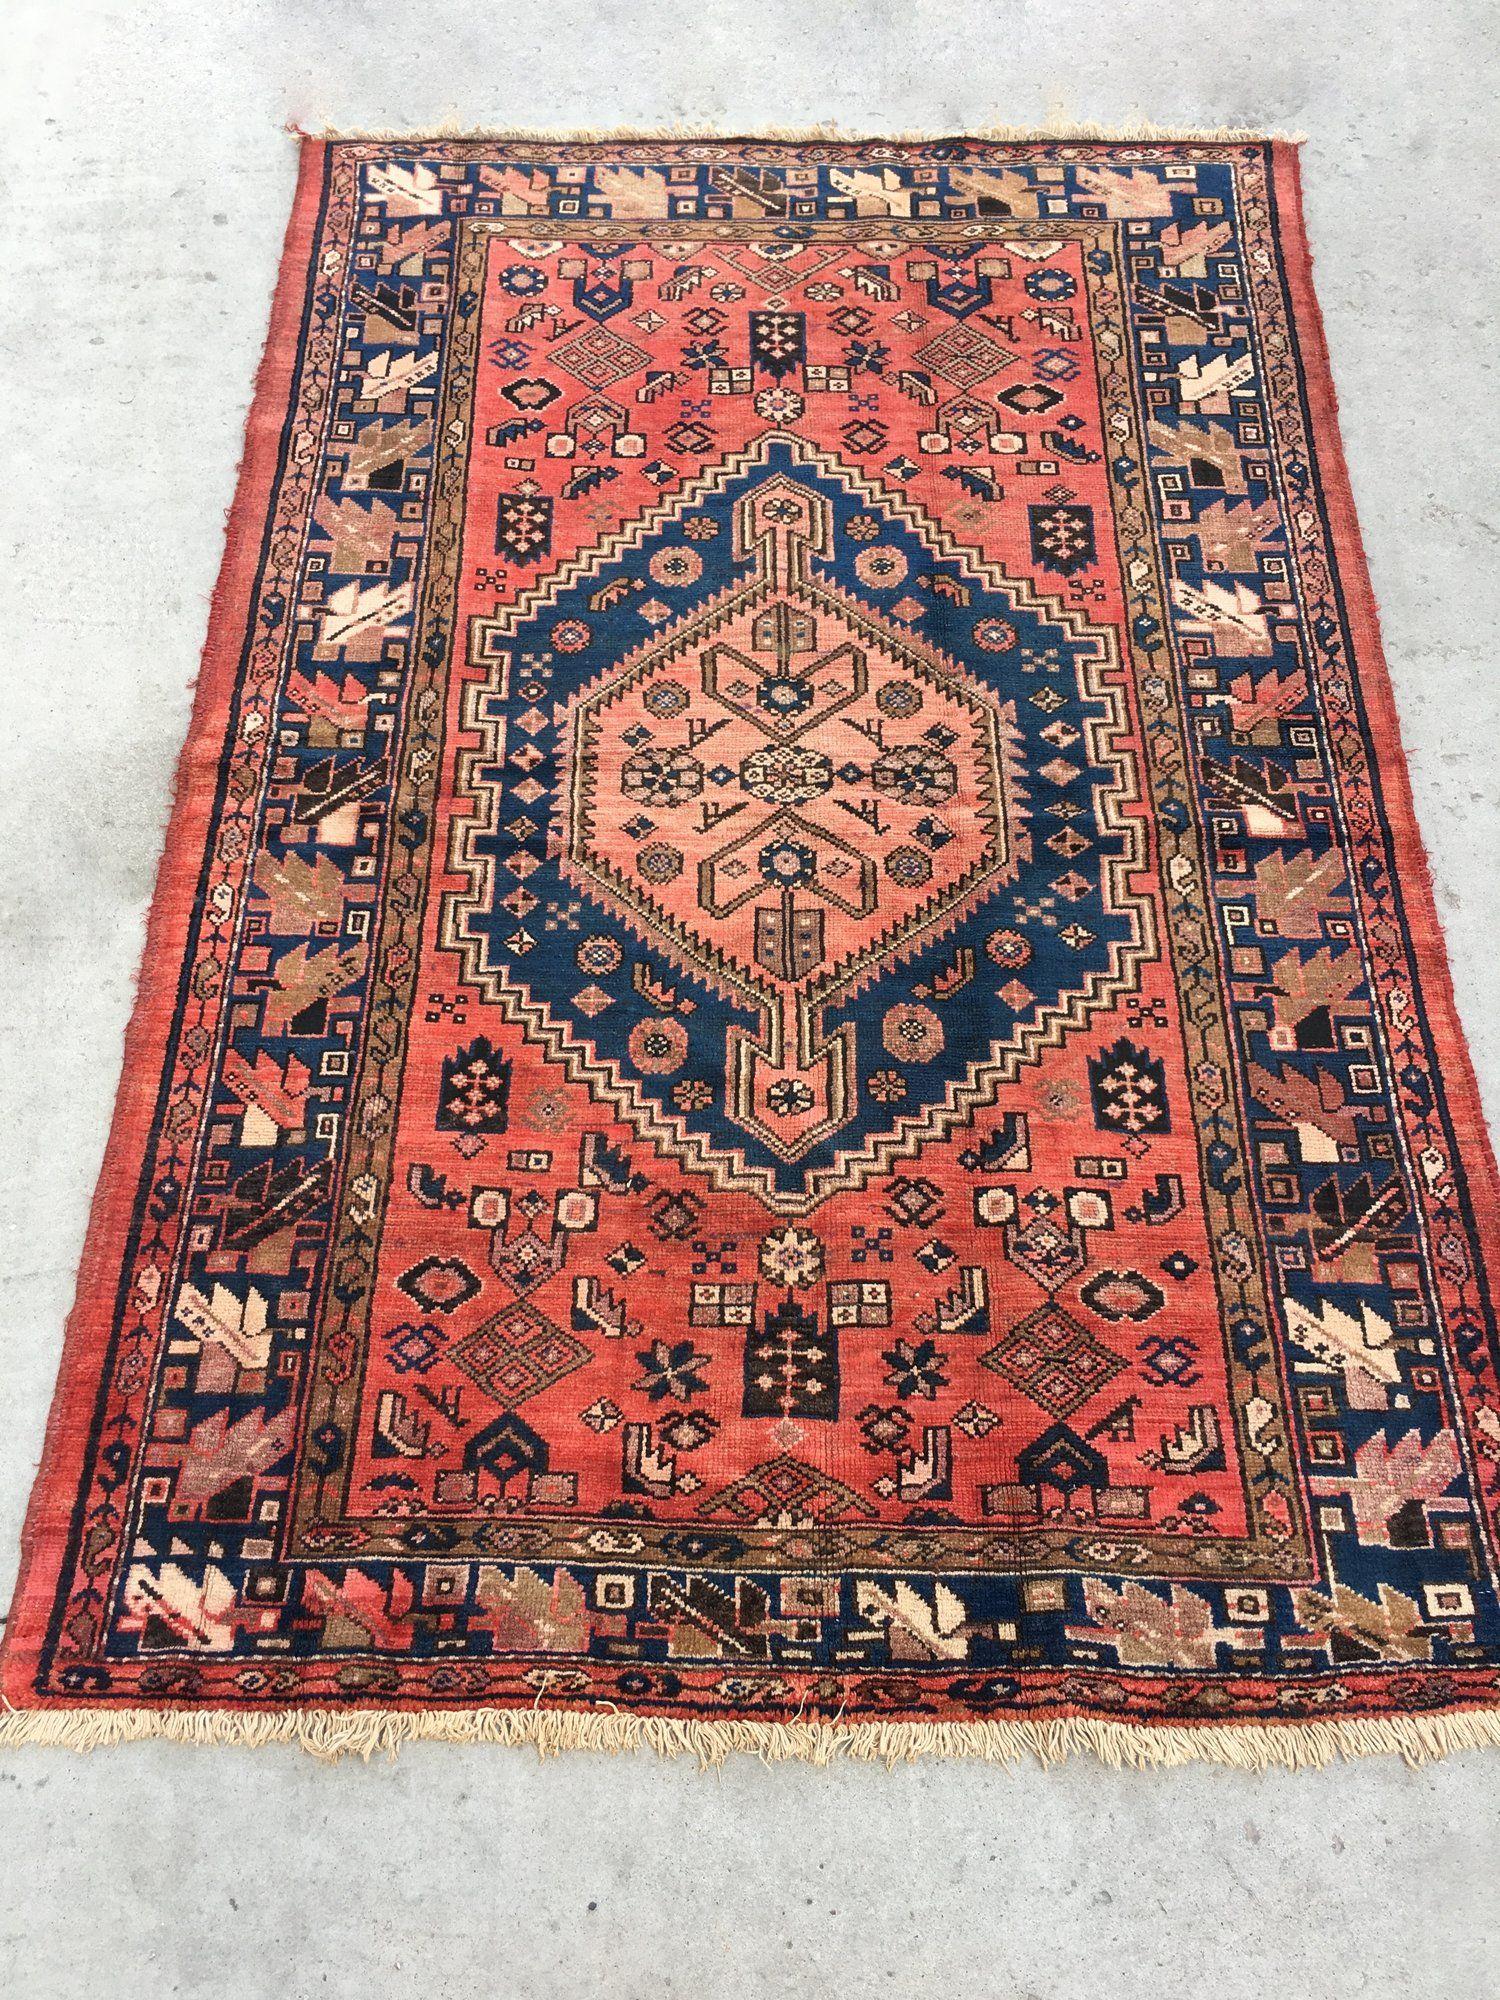 Persian Rug 4 4 X 6 7 By Loom Kiln Shop Rugs Persian Rug